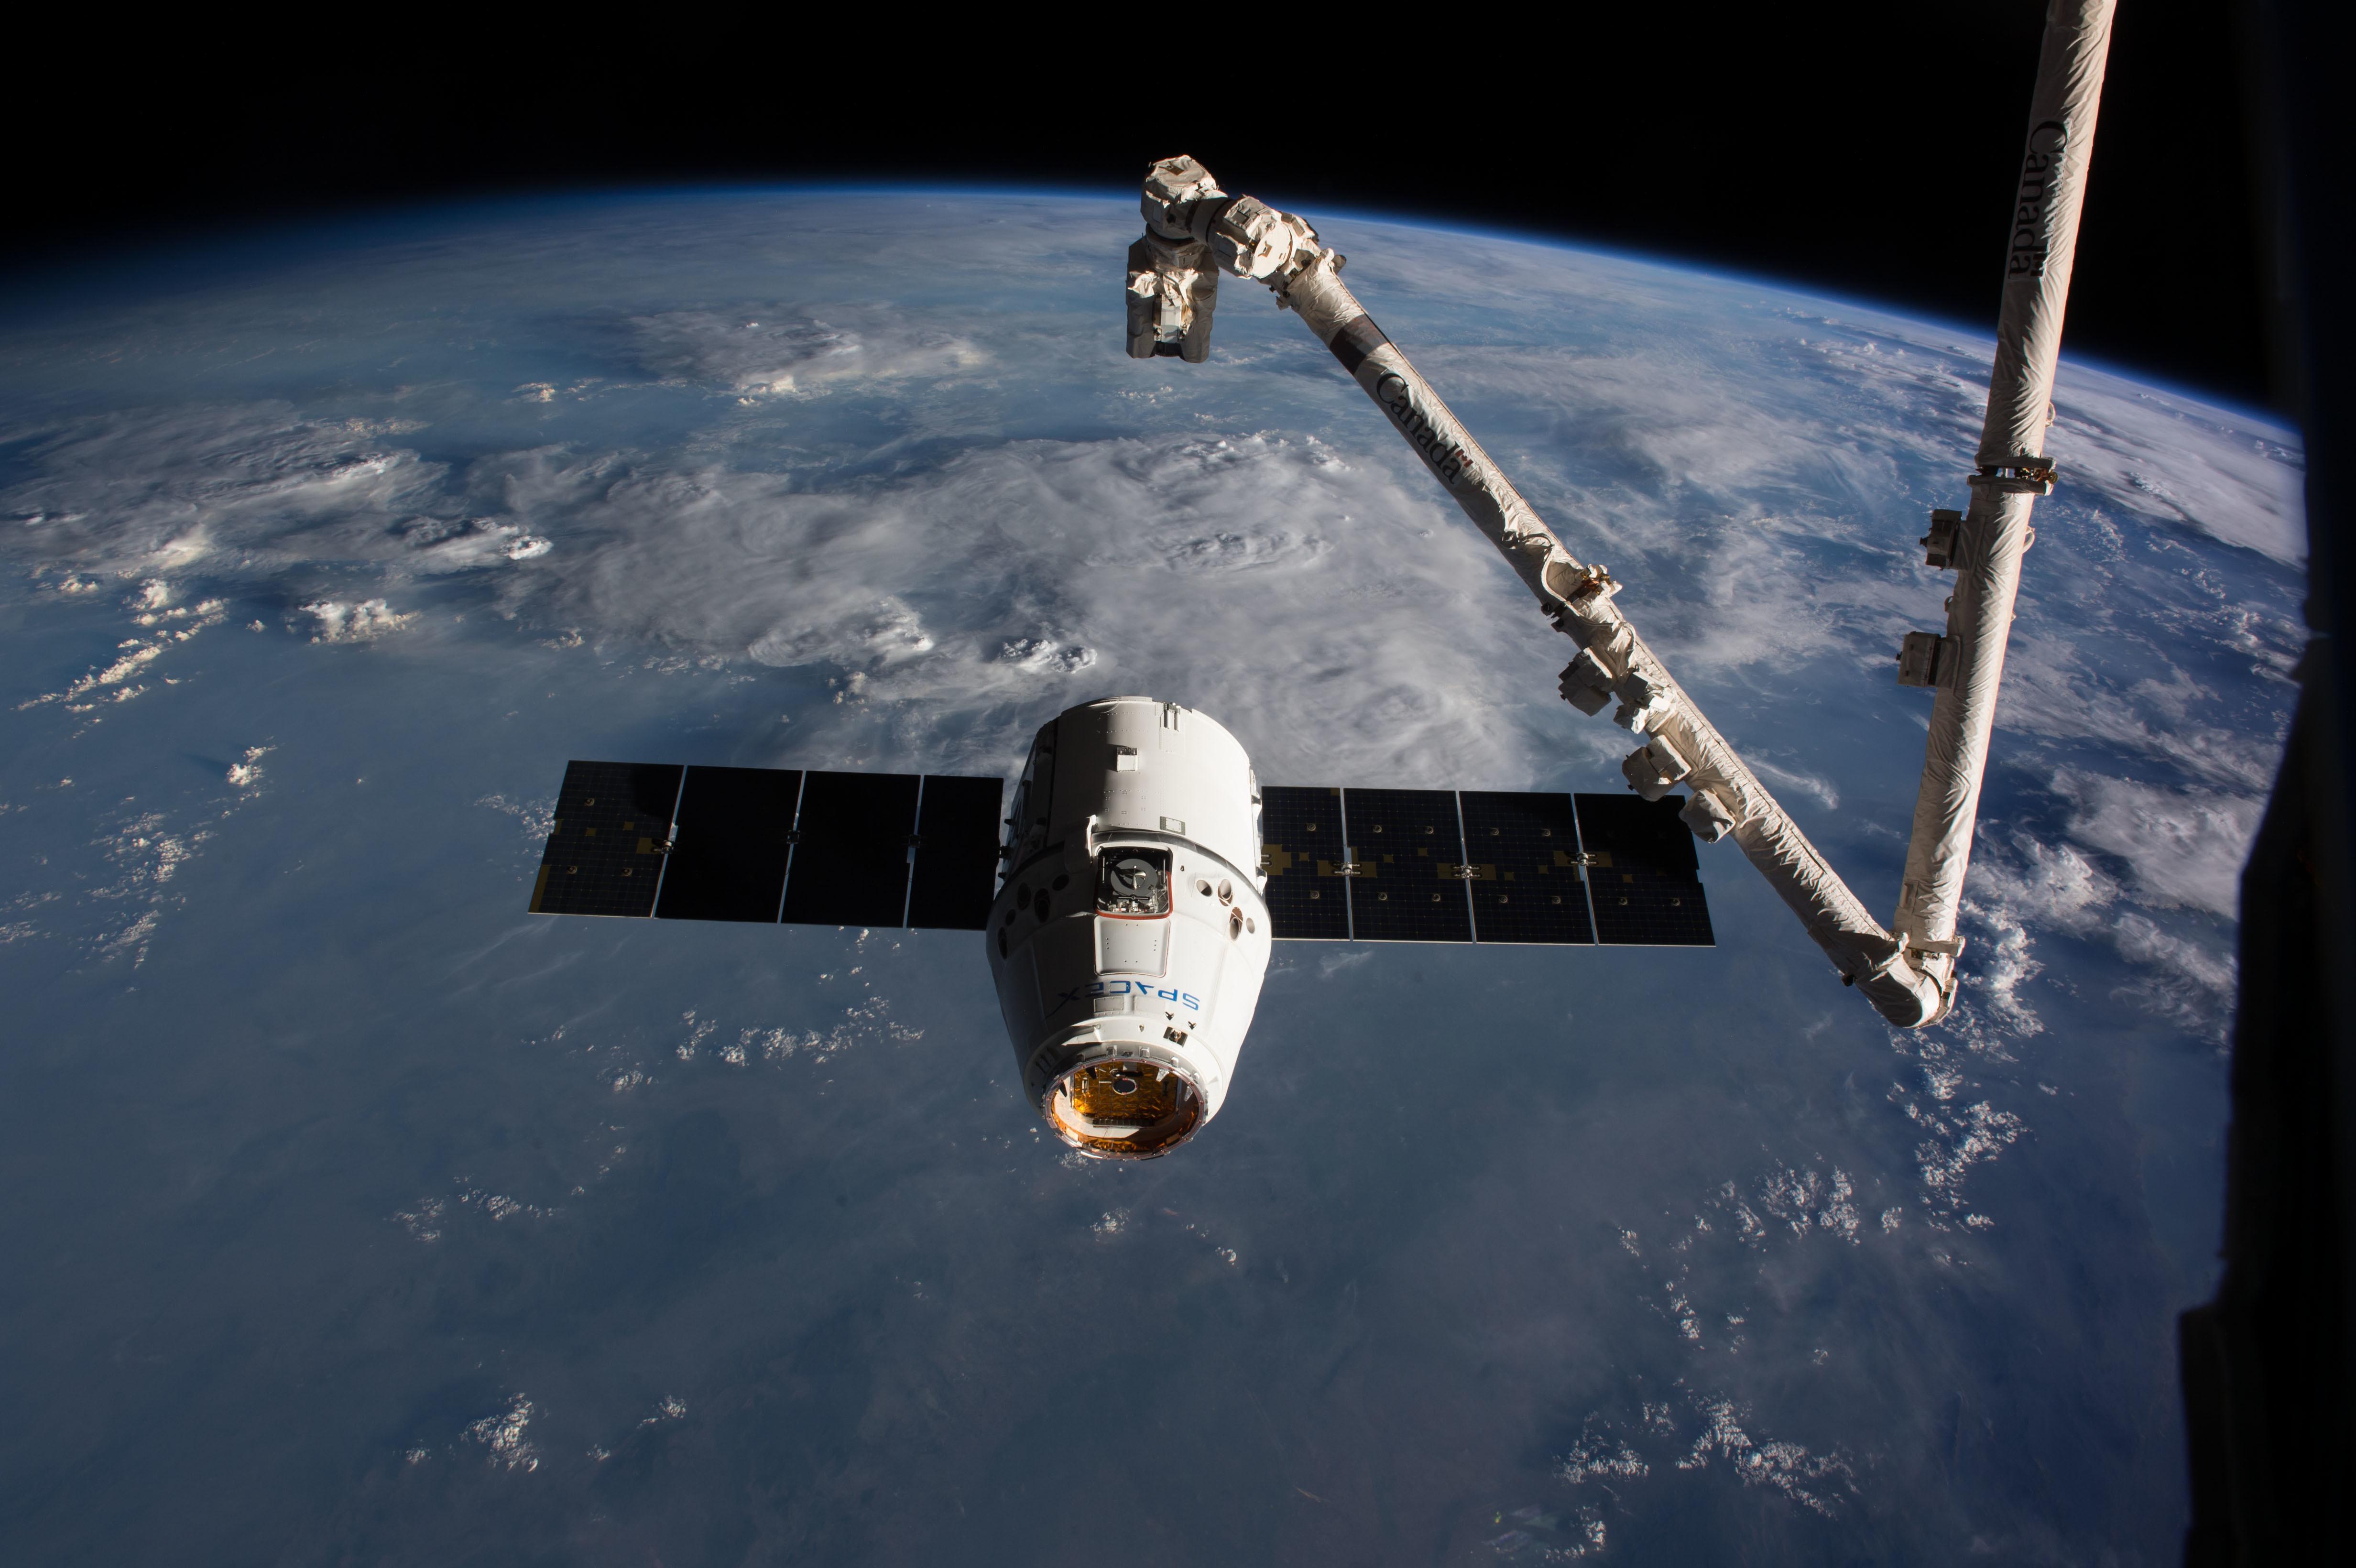 "<p>Фото &copy; Flickr/<a href=""https://www.flickr.com/photos/nasa2explore/32269420513/"" target=""_blank"">NASA Johnson</a></p> <div> <div></div> </div>"